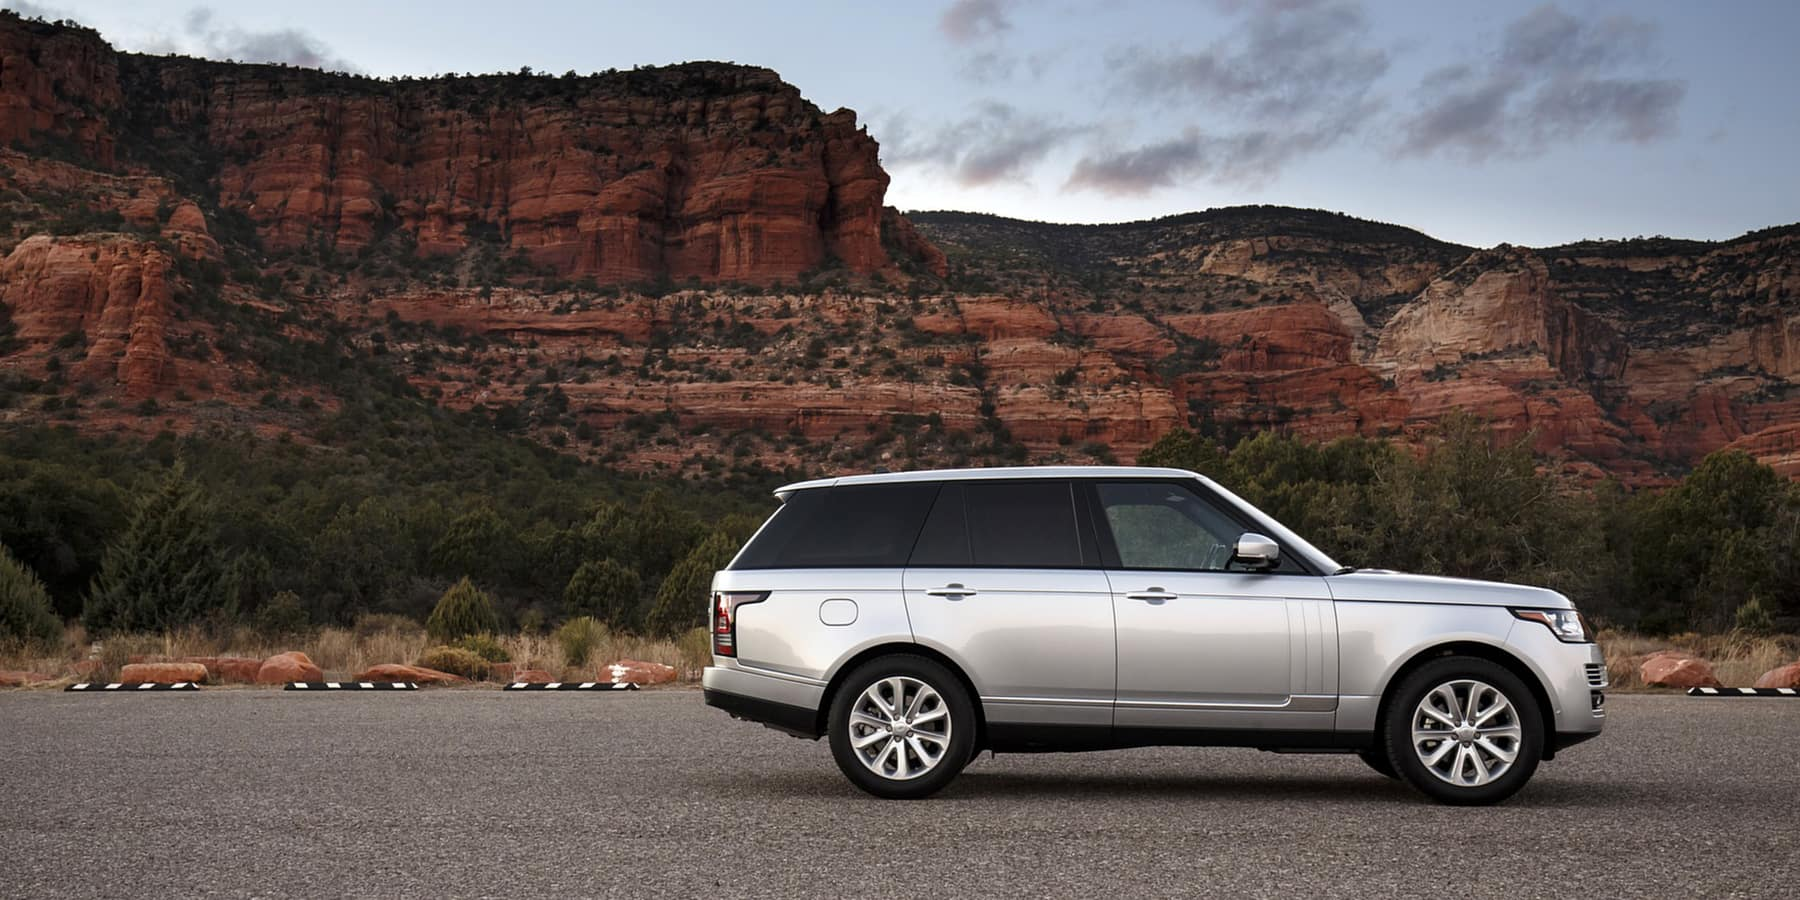 Land Rover Dealer in Phoenix | Land Rover North Scottsdale